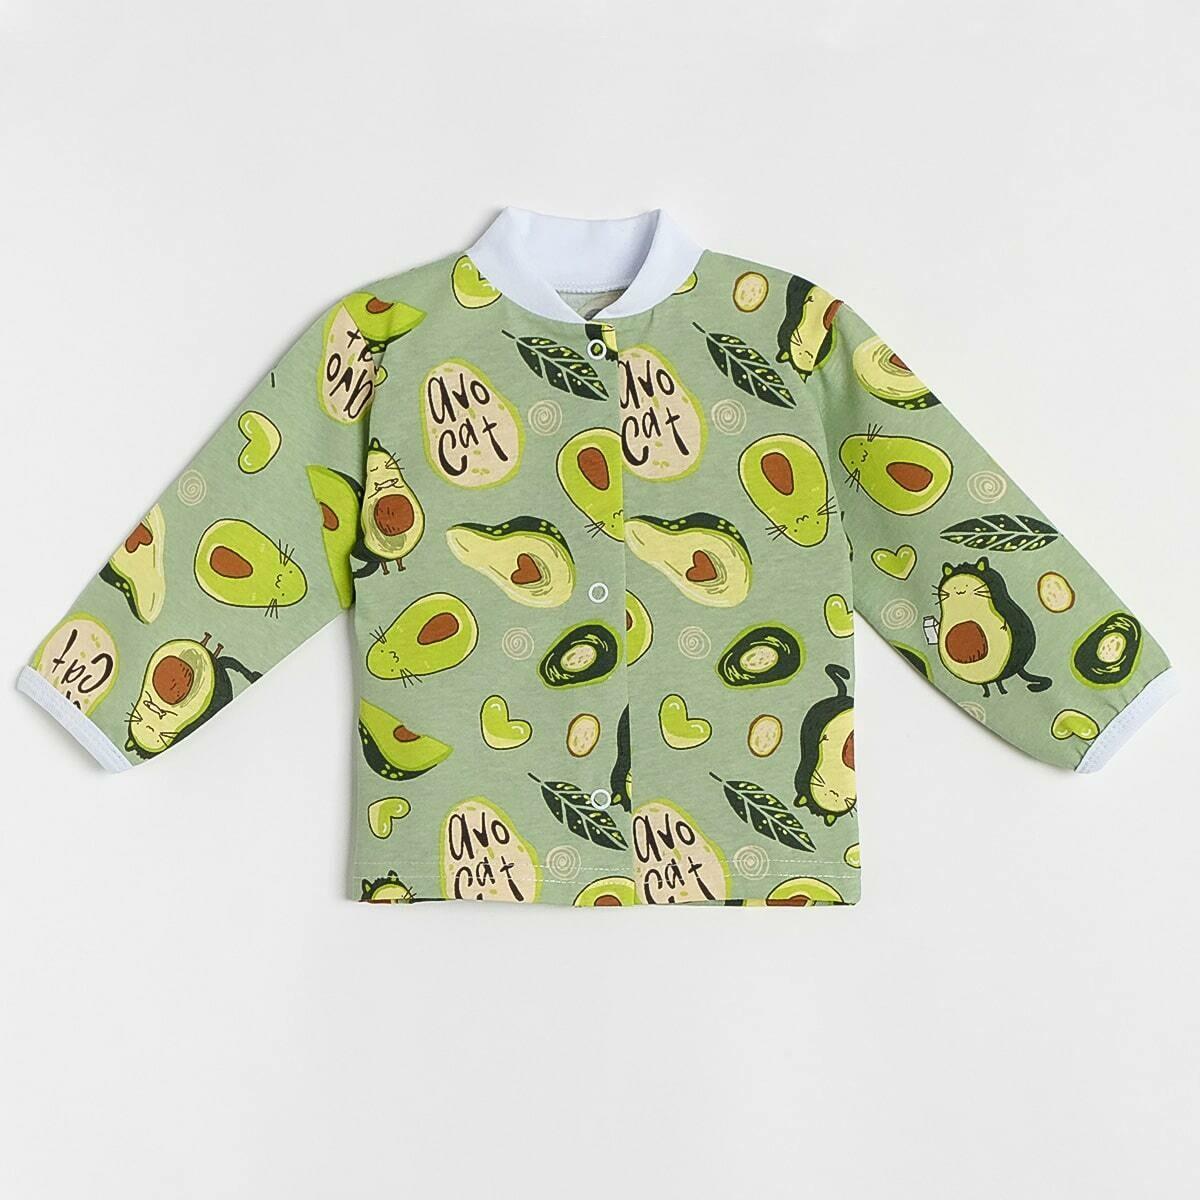 Кофточка Леопольд, тонкий трикотаж, авокадо